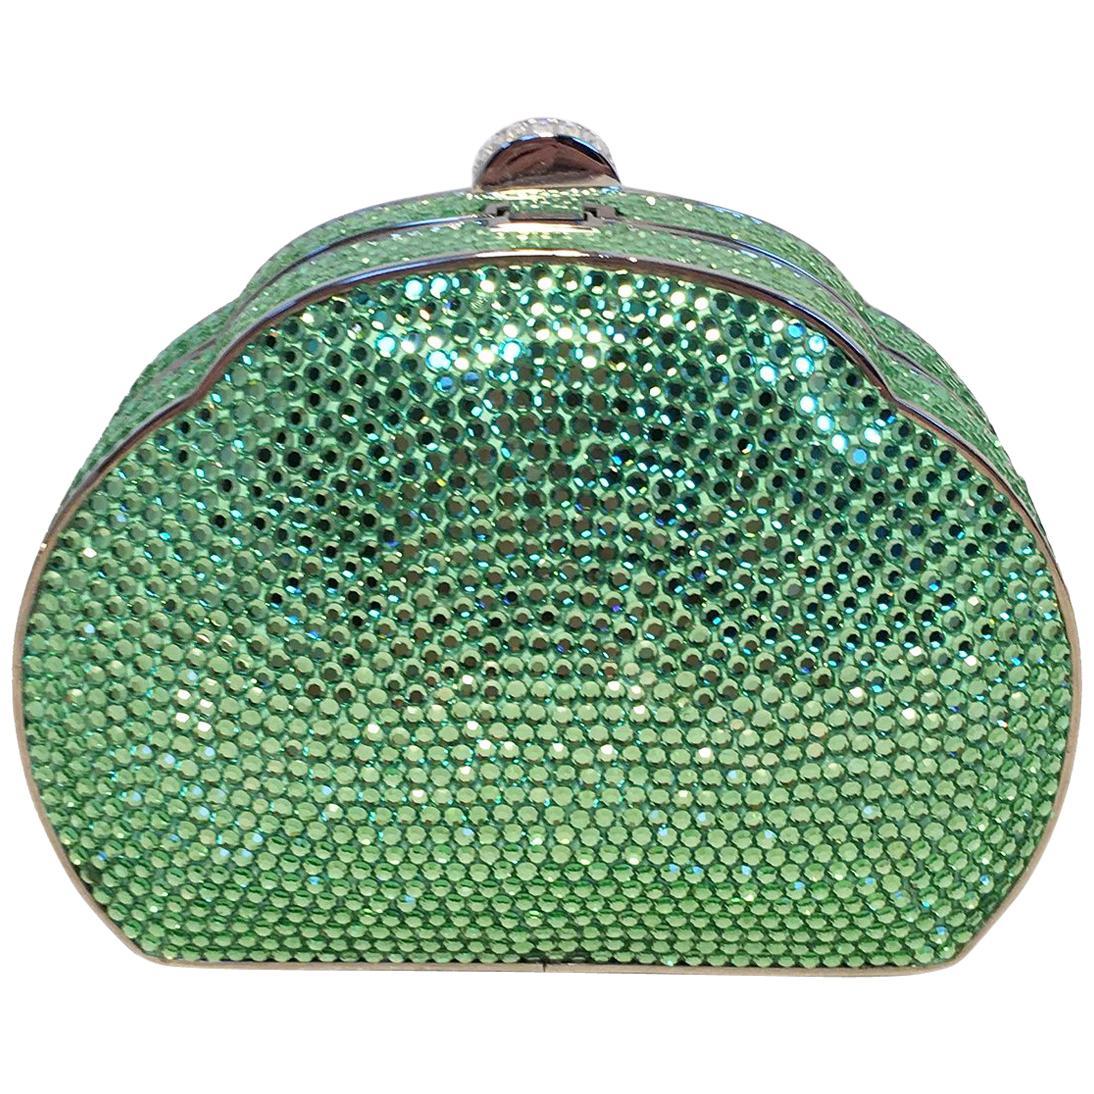 Judith Leiber Green Swarovski Crystal Minaudiere Evening Bag